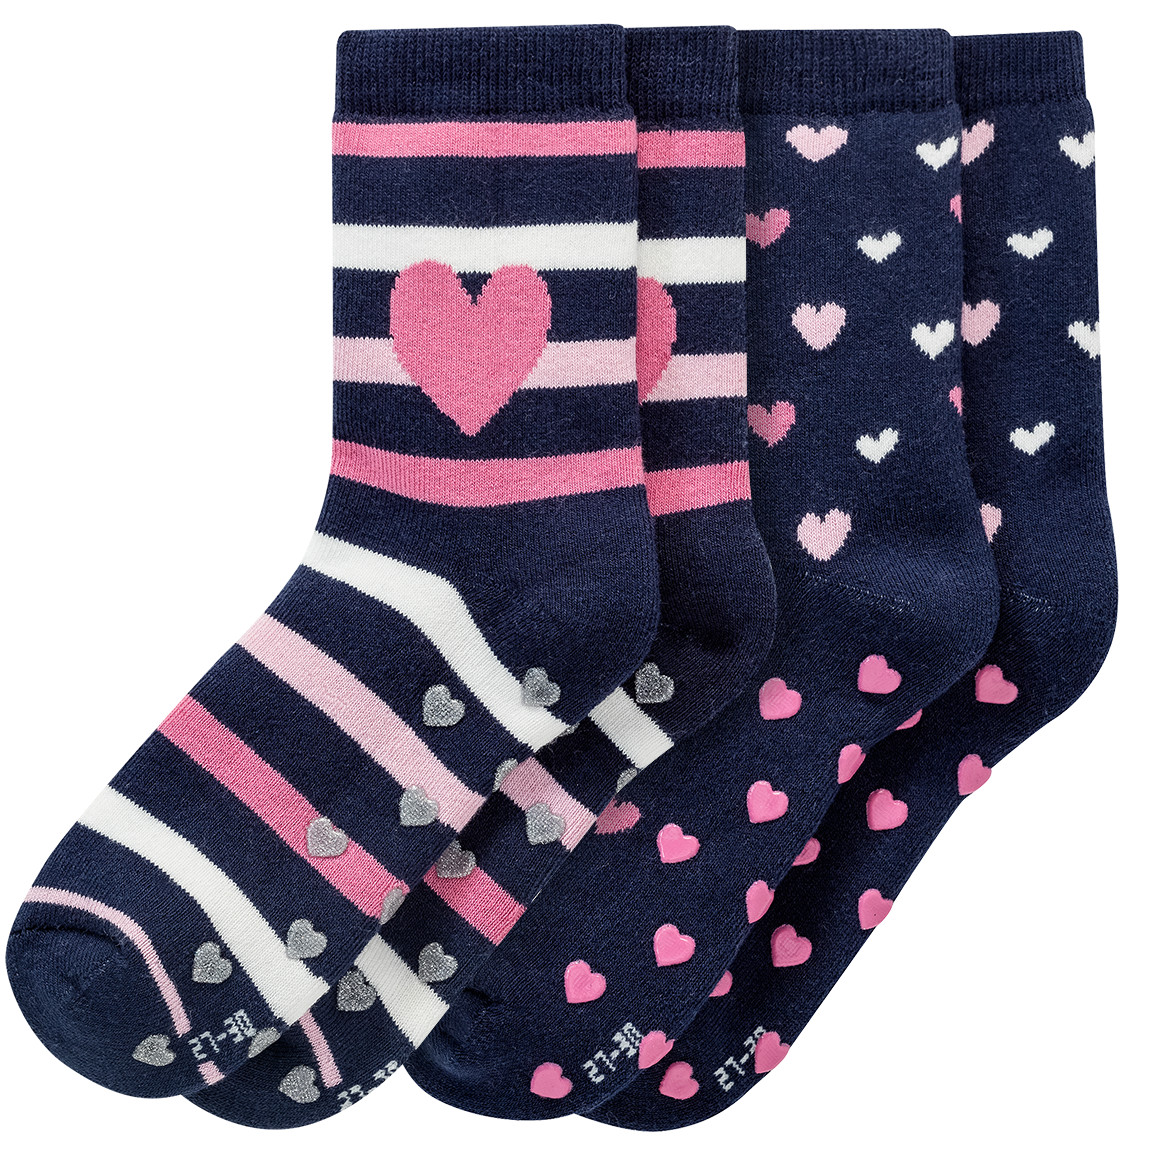 Minigirlaccessoires - 2 Paar Mädchen Vollfrottee Socken - Onlineshop Ernstings family